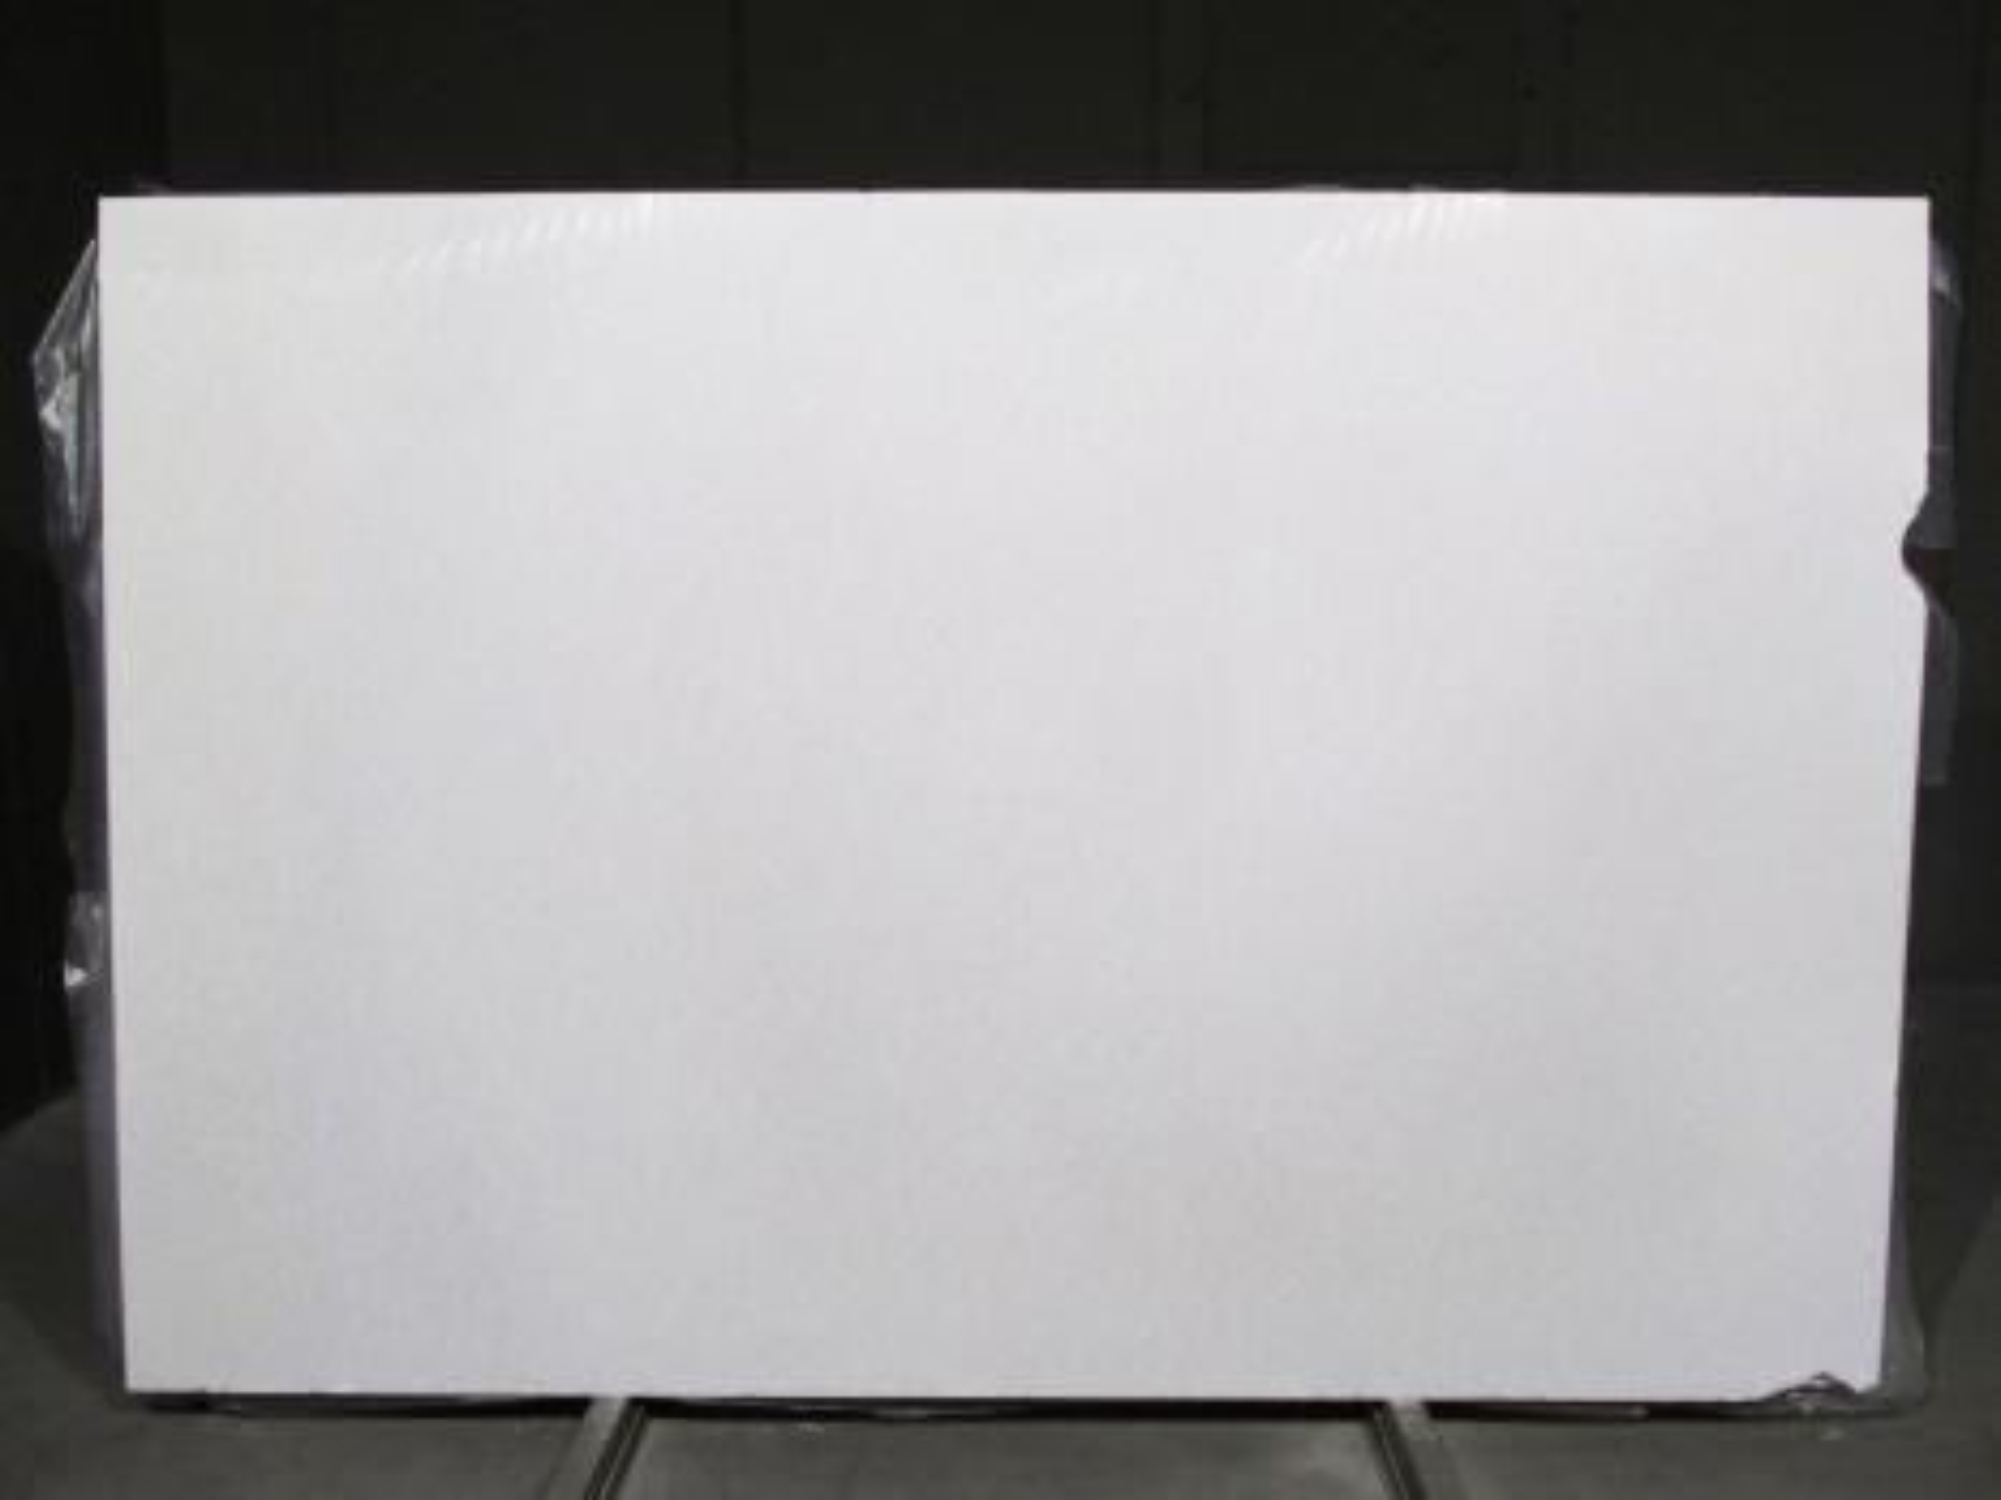 BIANCO NEVE polierte Unmaßplatten 1597M aus Natur Marmor , SL2CM: Lieferung Veneto, Italien